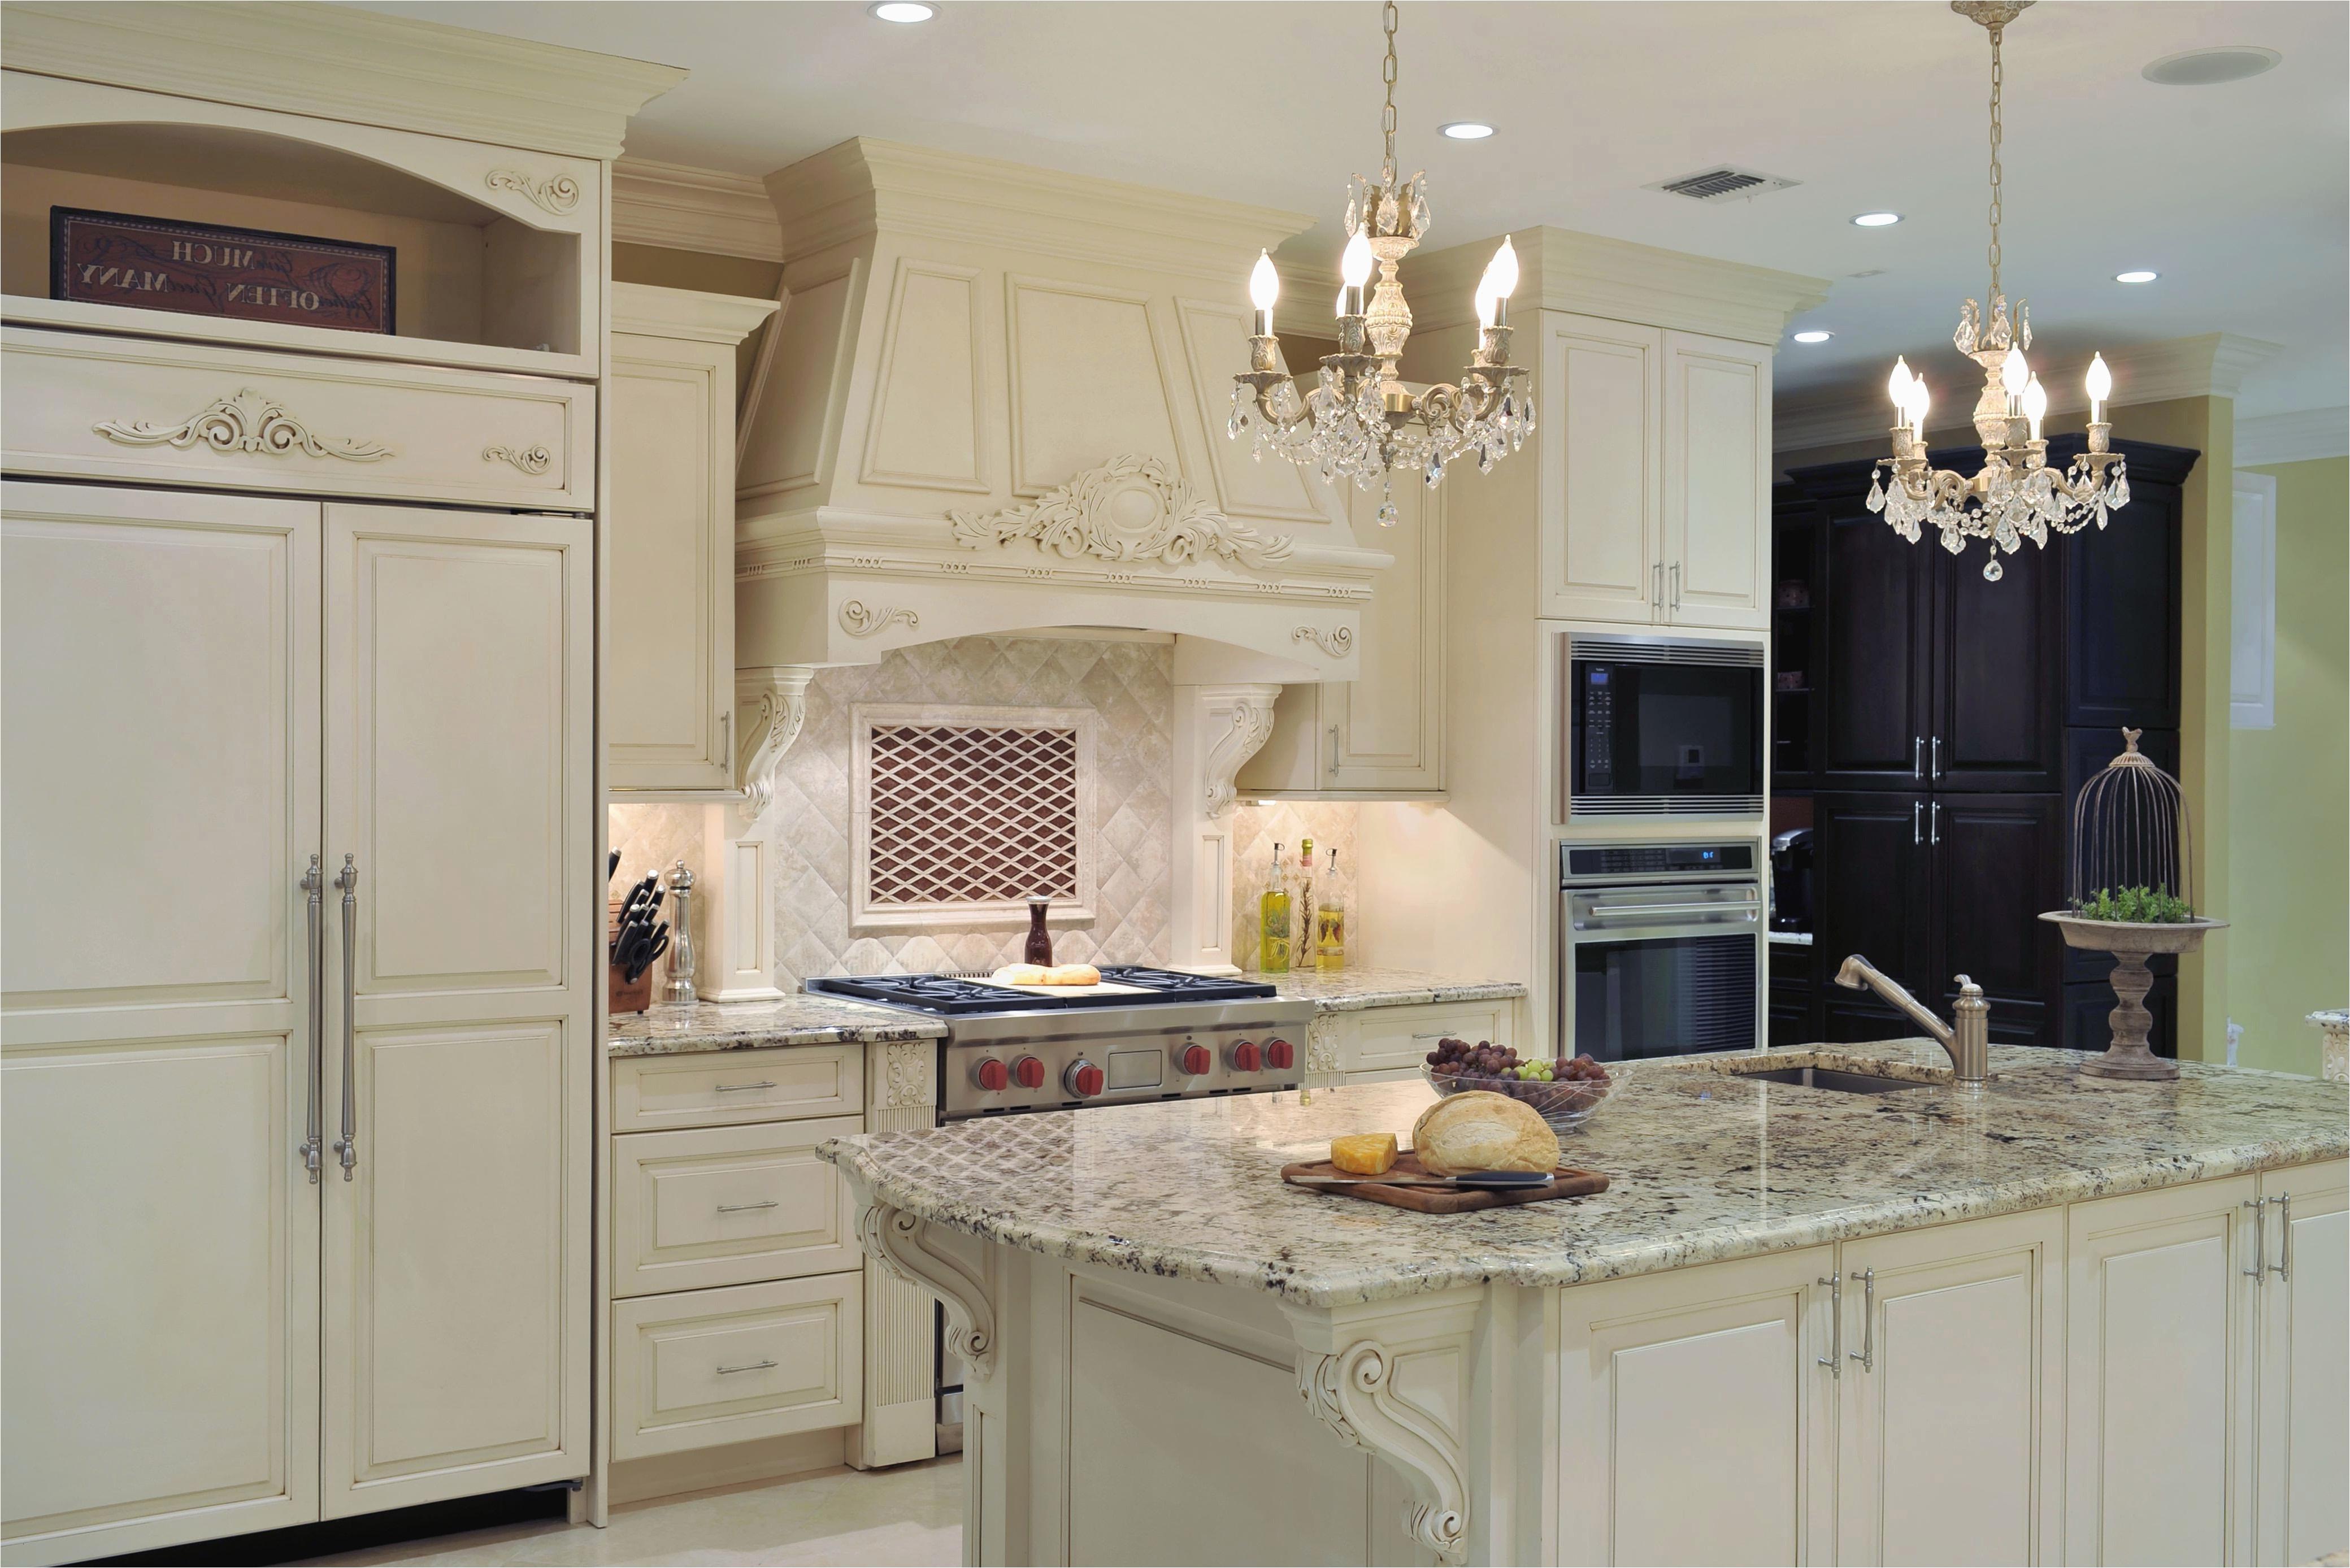 Hampton Bay Under Cabinet Lighting Elegant How Much Is Kitchen Cabinet Installation Lovely Kitchen Cabinet 0d